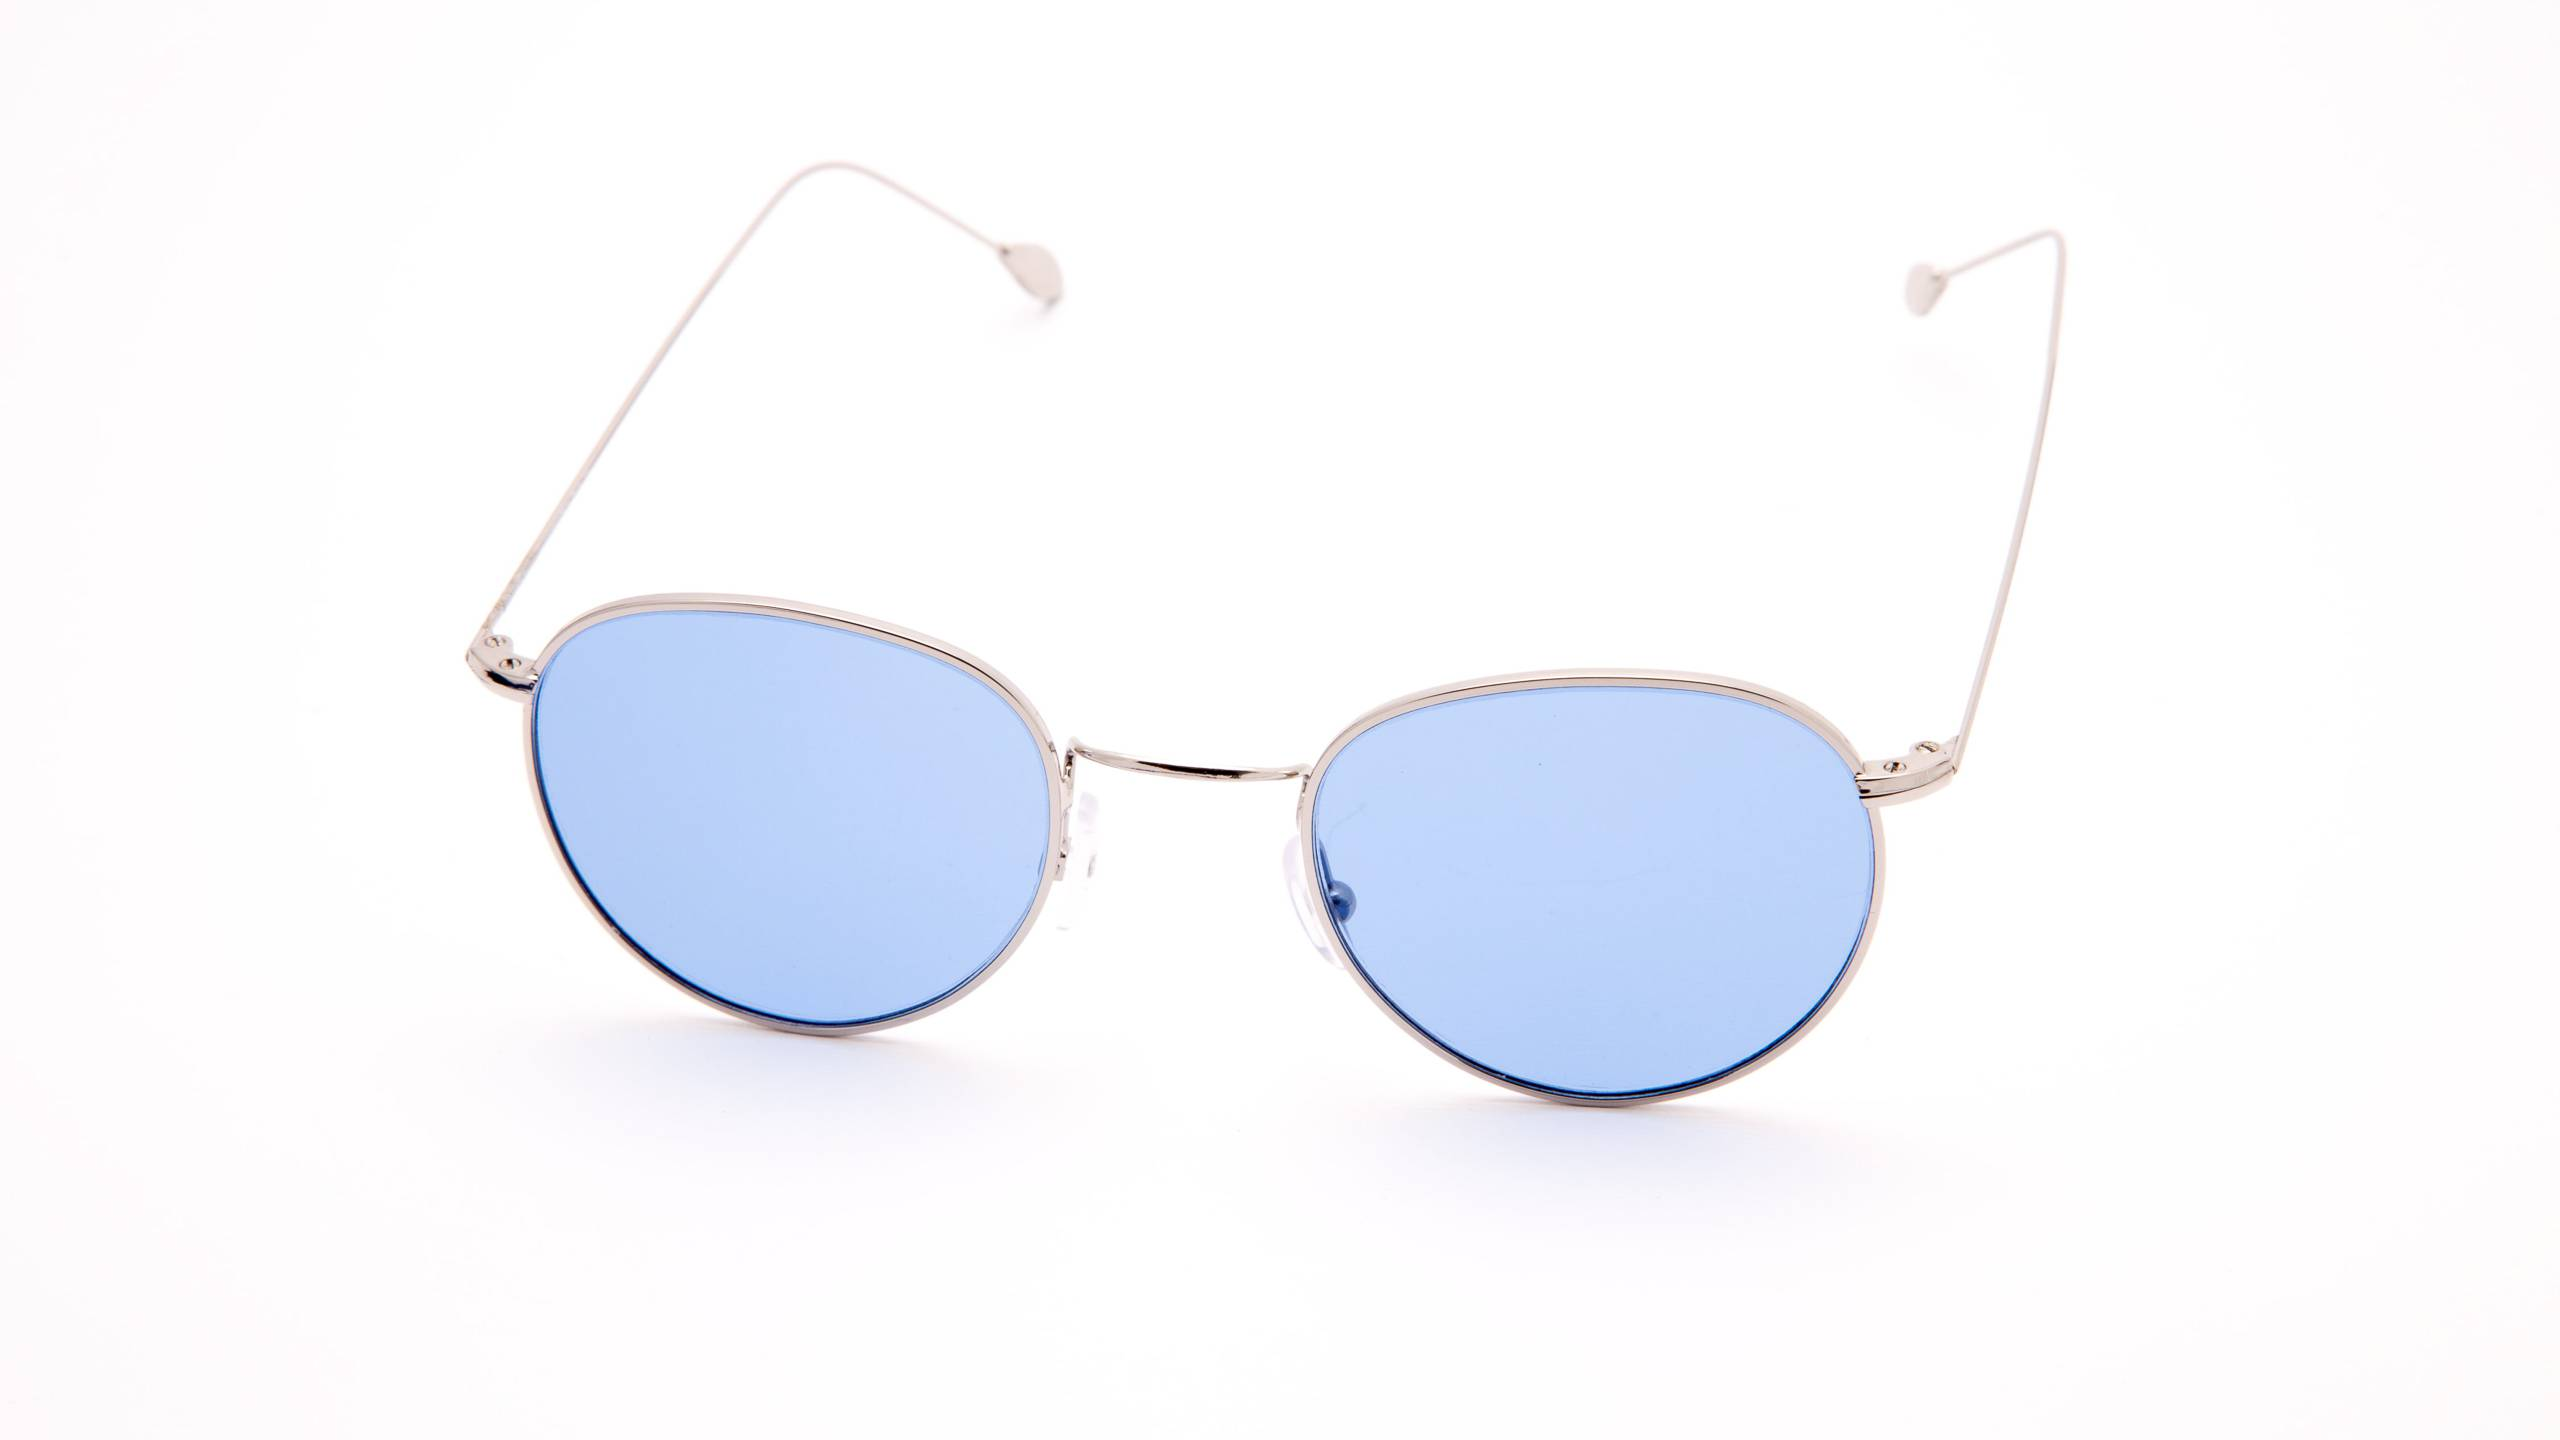 eyeglasses-Nathan-Kaltermann-made-in-Italy-PALMAROLA-ARG-UNISEX-SOLE2